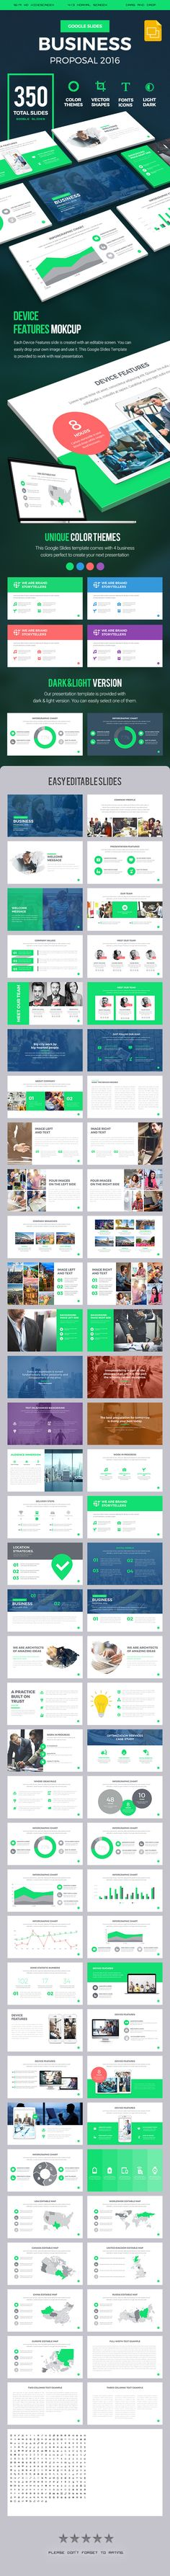 Business Proposal 2016 Google Slides Presentation Template. Download here: http://graphicriver.net/item/business-proposal-2016-google-slides-presentation-template/16328855?ref=ksioks